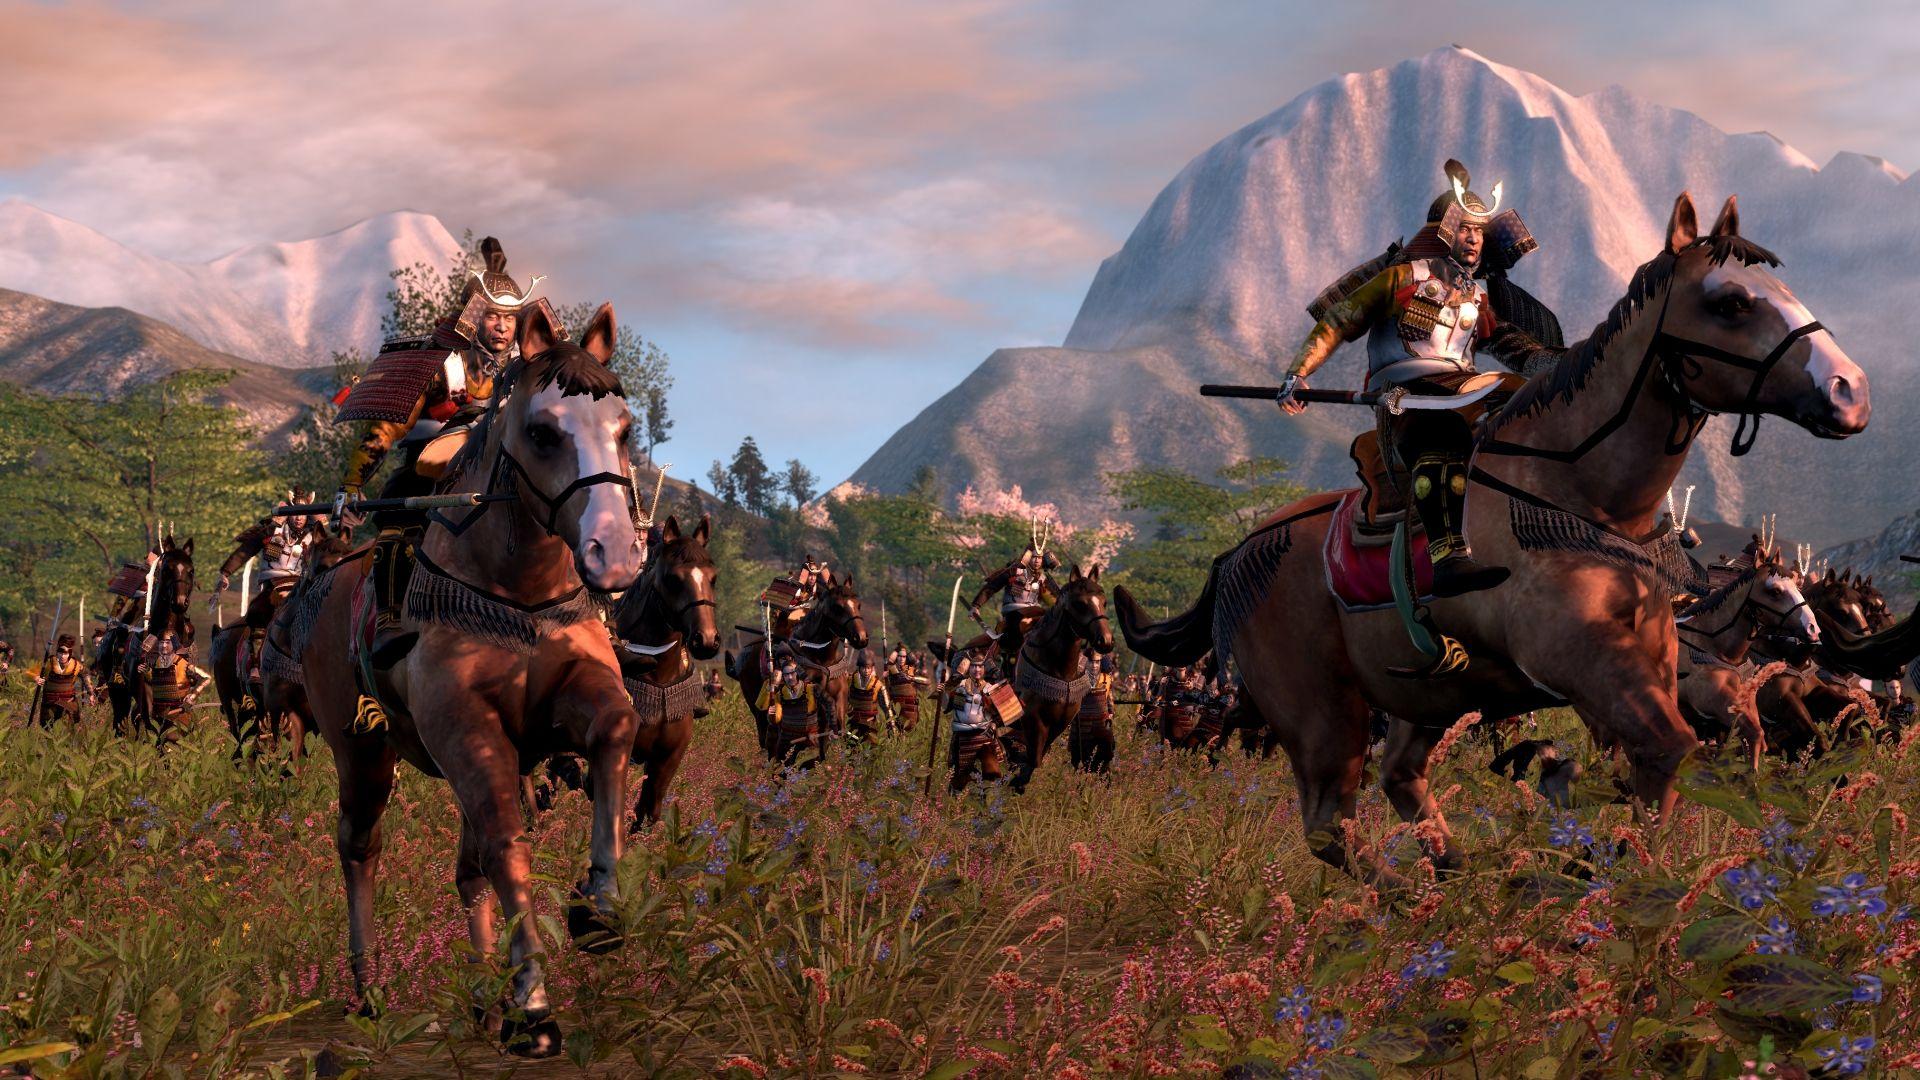 Shogun 2 Fall Of The Samurai Wallpaper Acheter Total War Shogun 2 Rise Of The Samurai Campaign